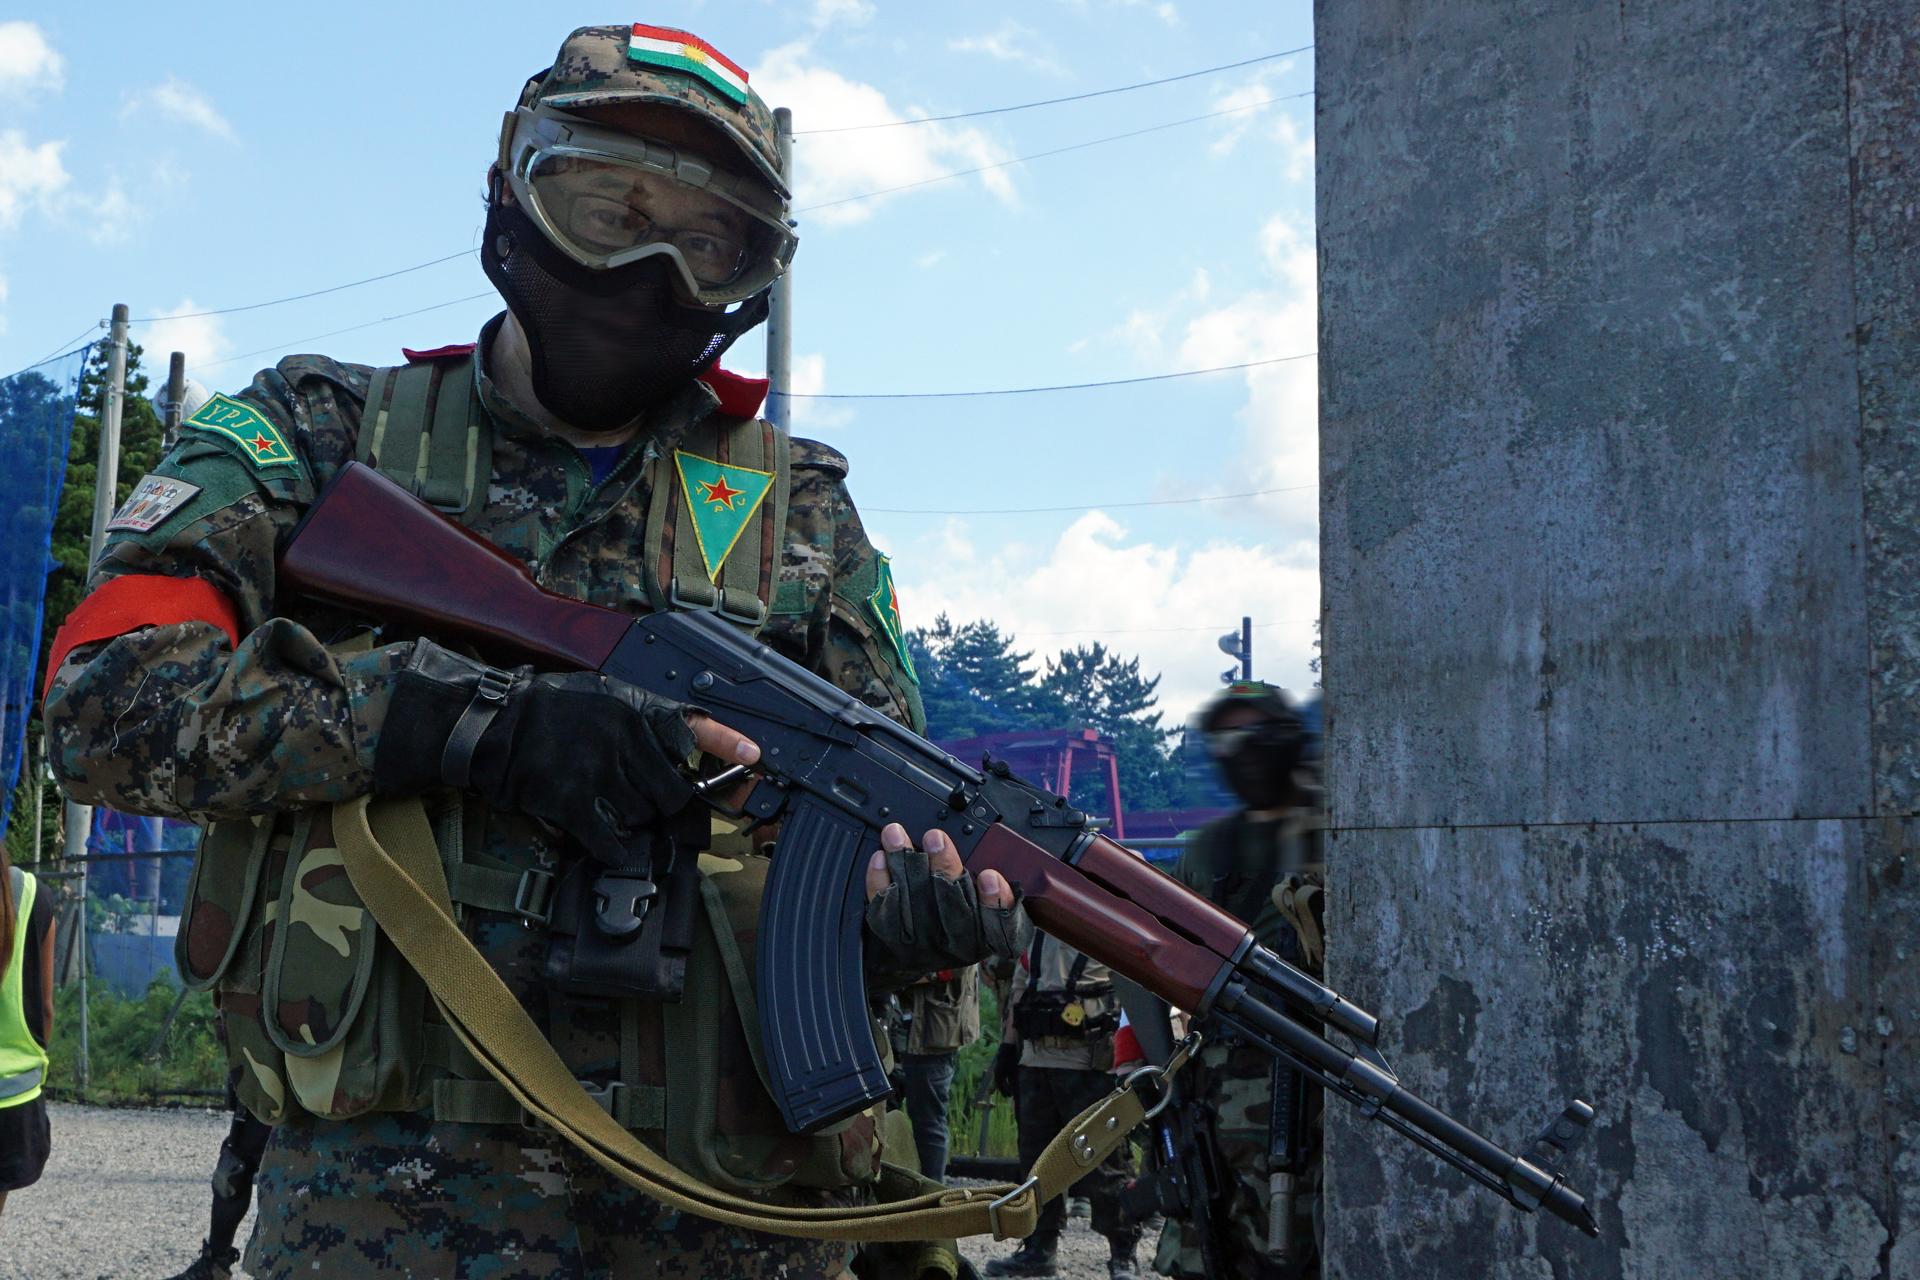 「AKM」が多用される「クルド部隊」の装備を着用した